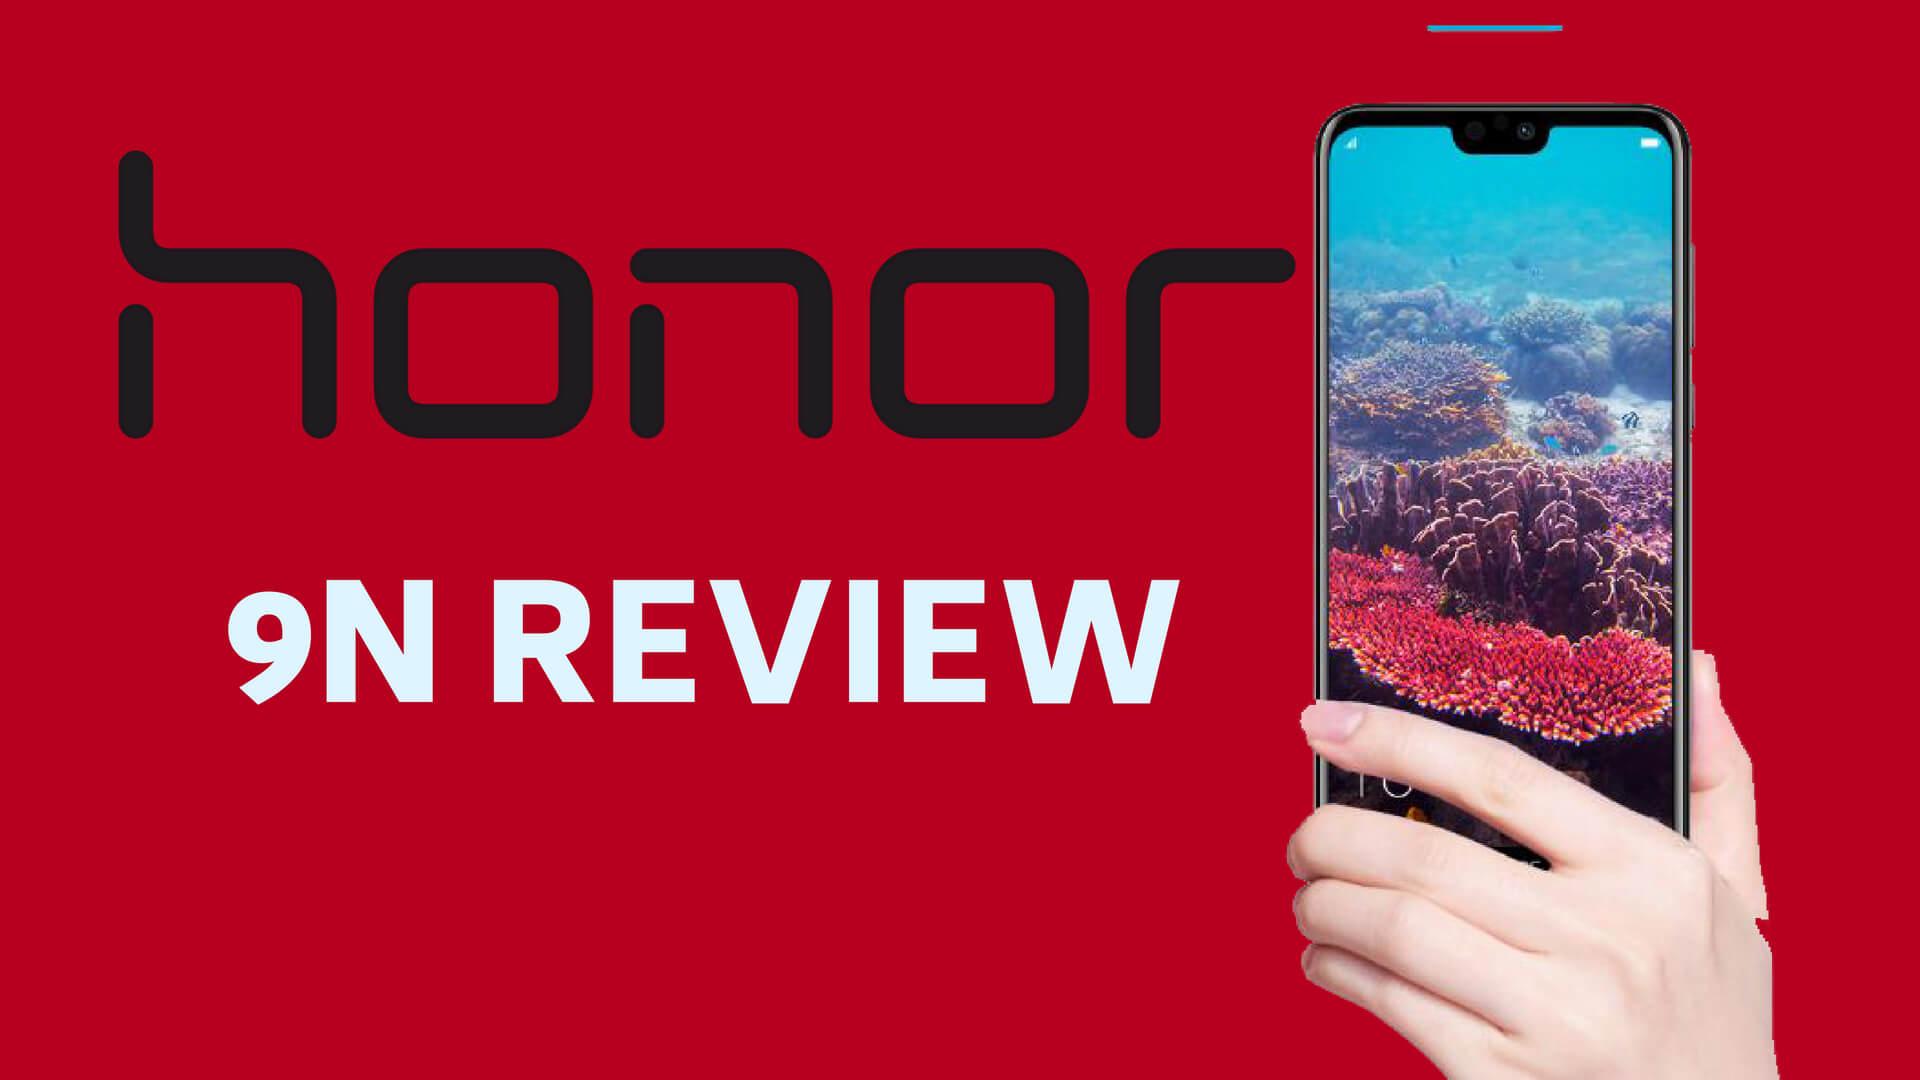 Honor 9N Review In Hindi